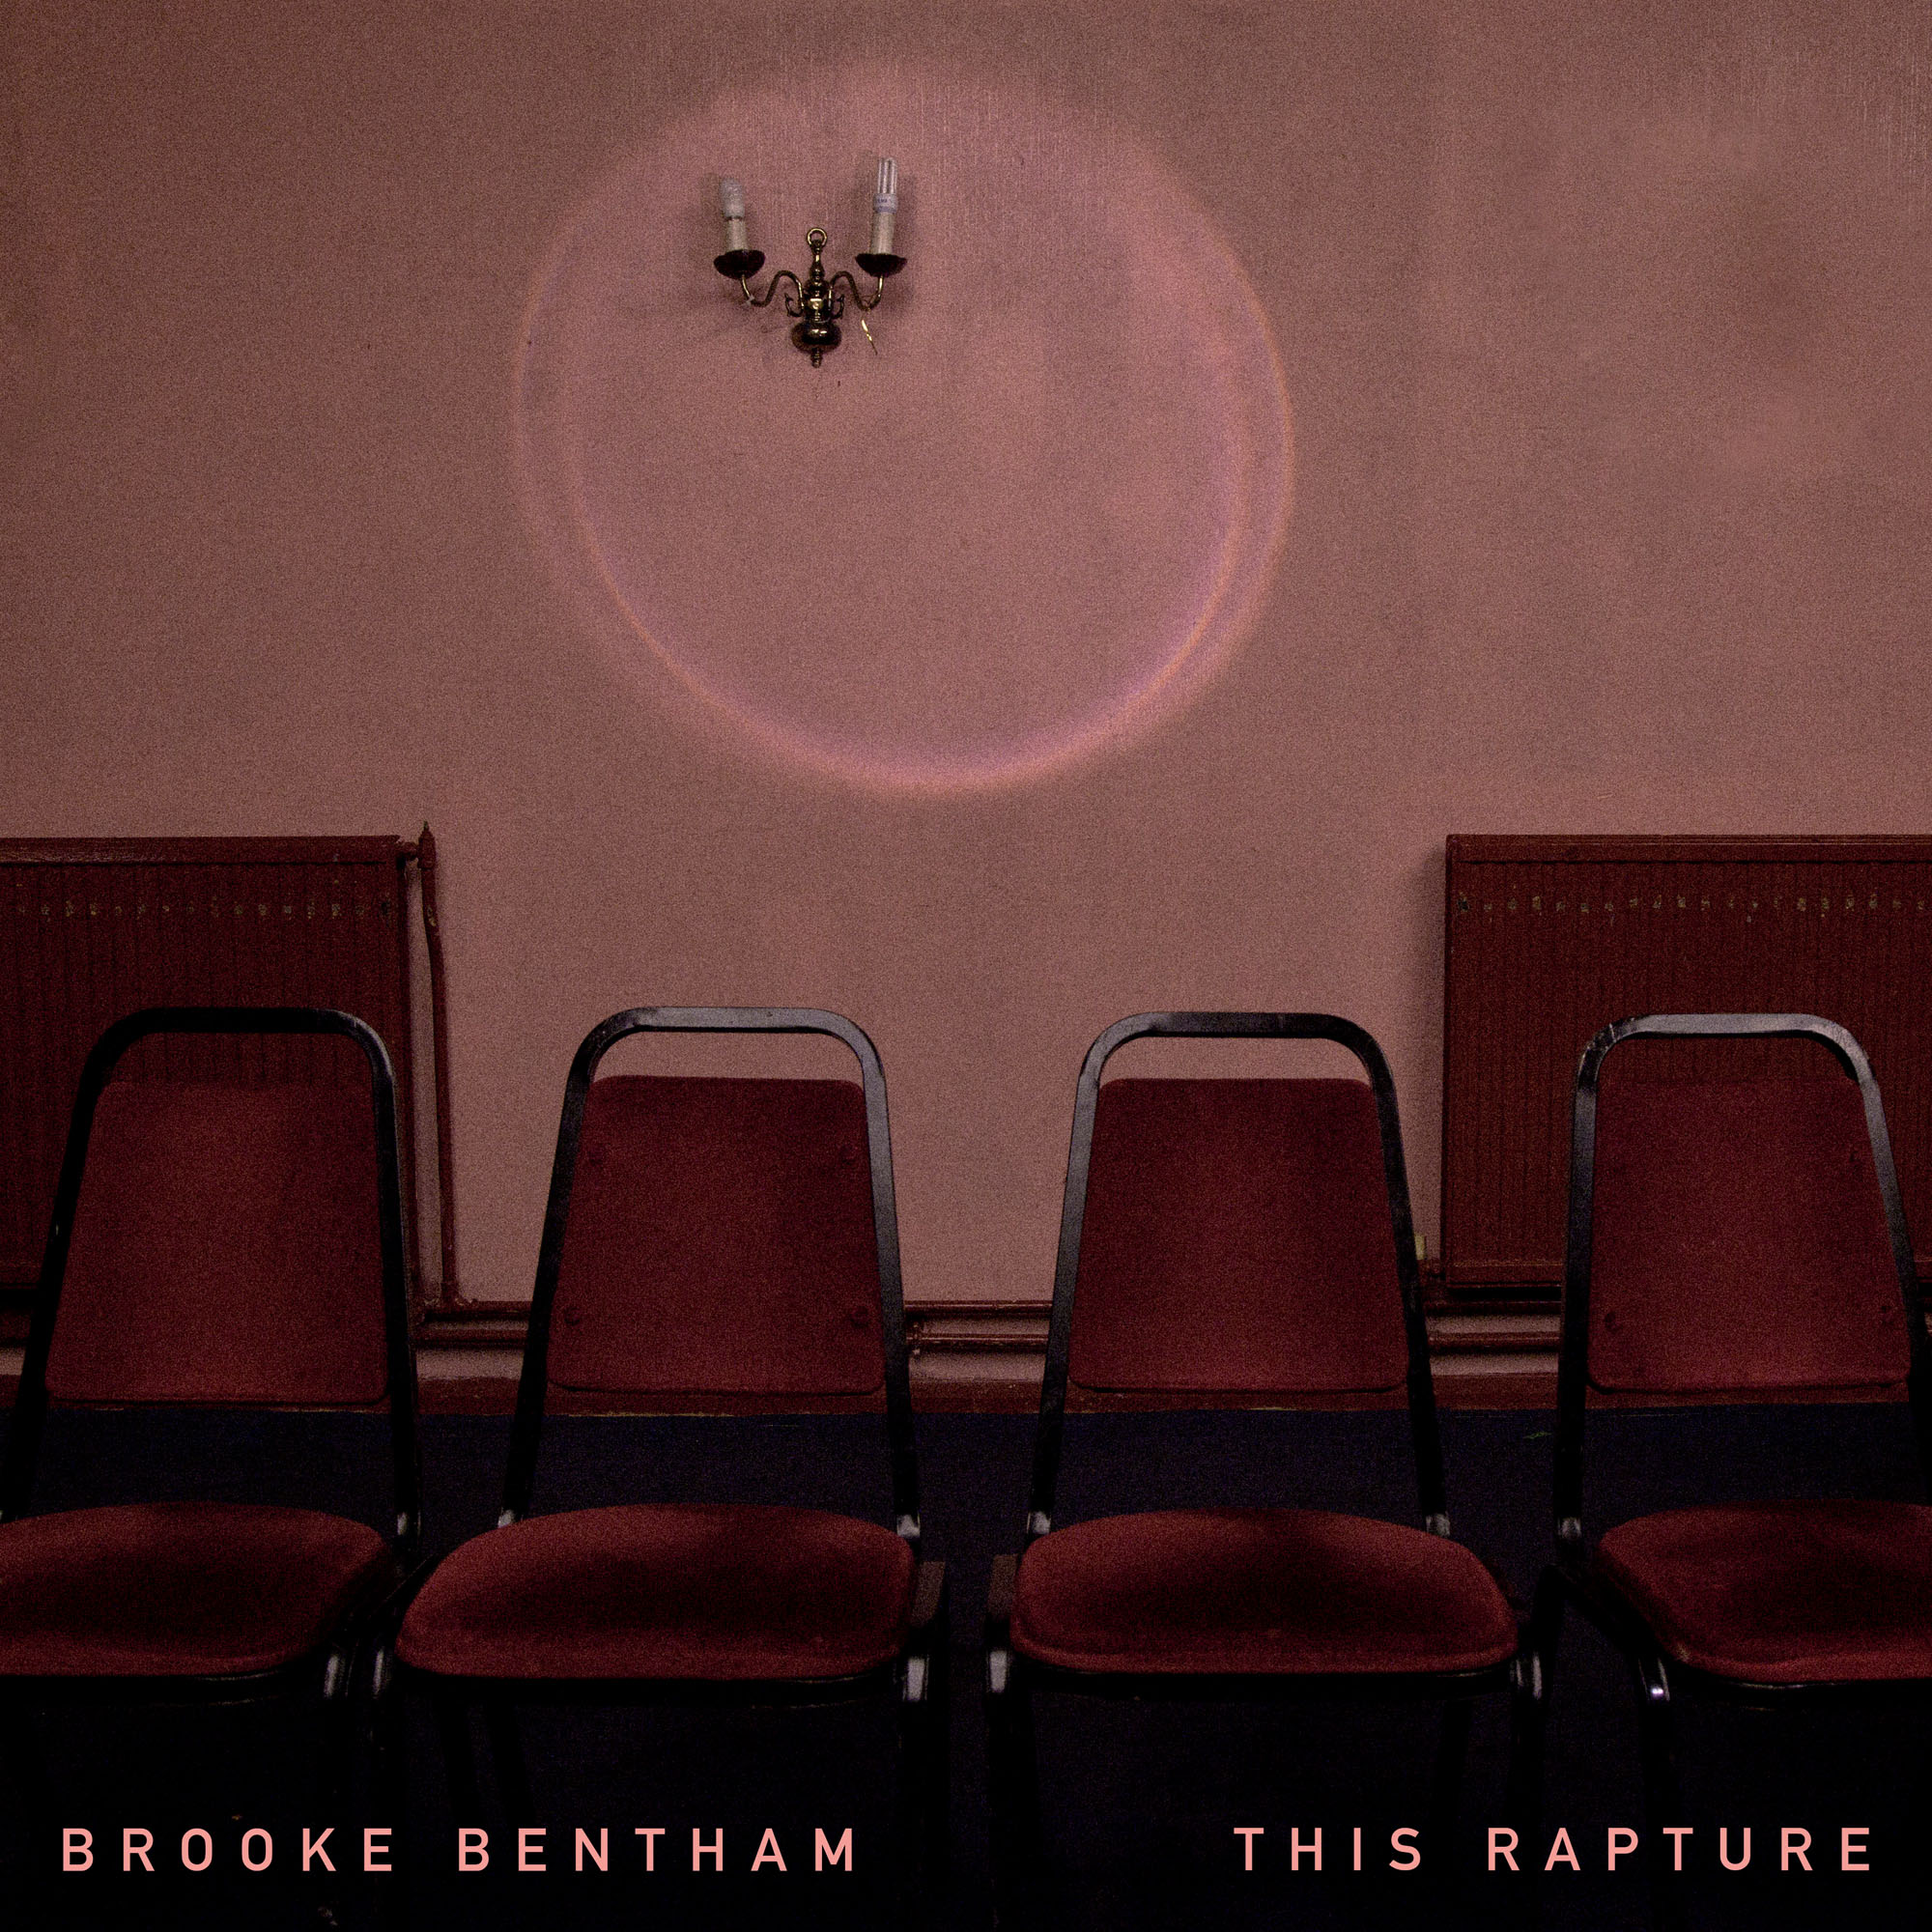 Brooke Bentham - This Rapture    Buy / Stream      brookebentham.co.uk